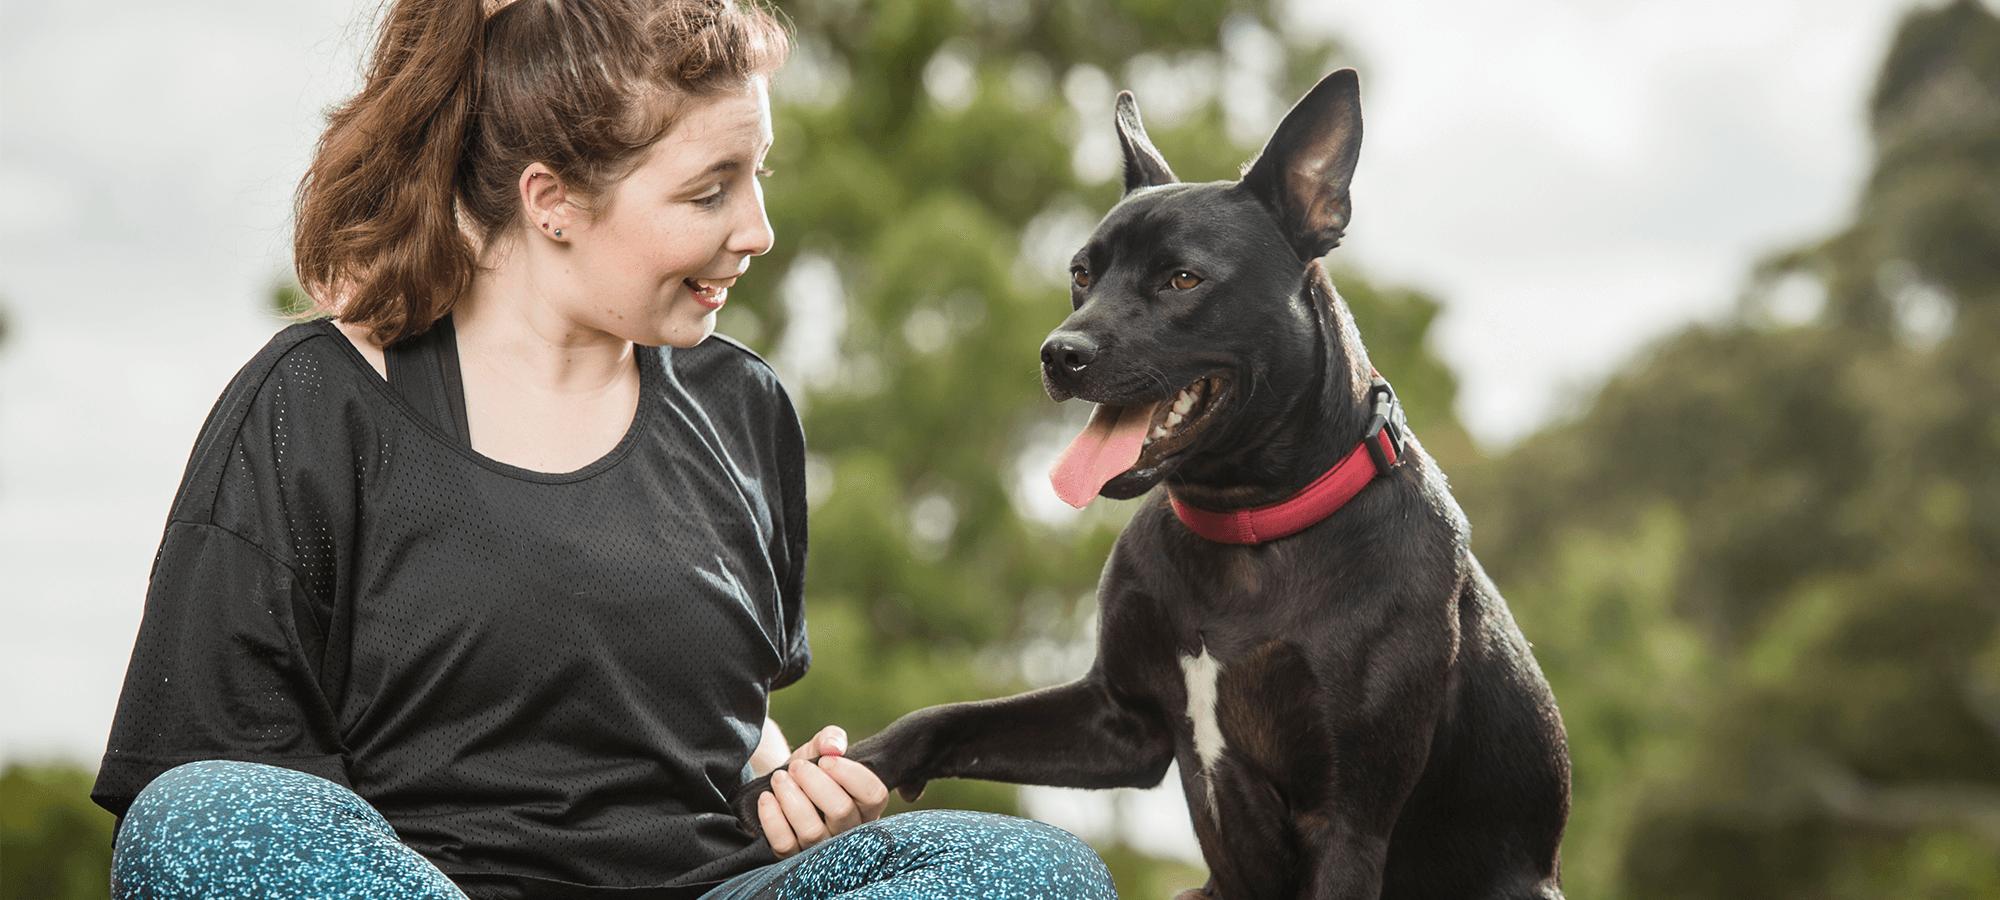 Benefits of Animal Adoption